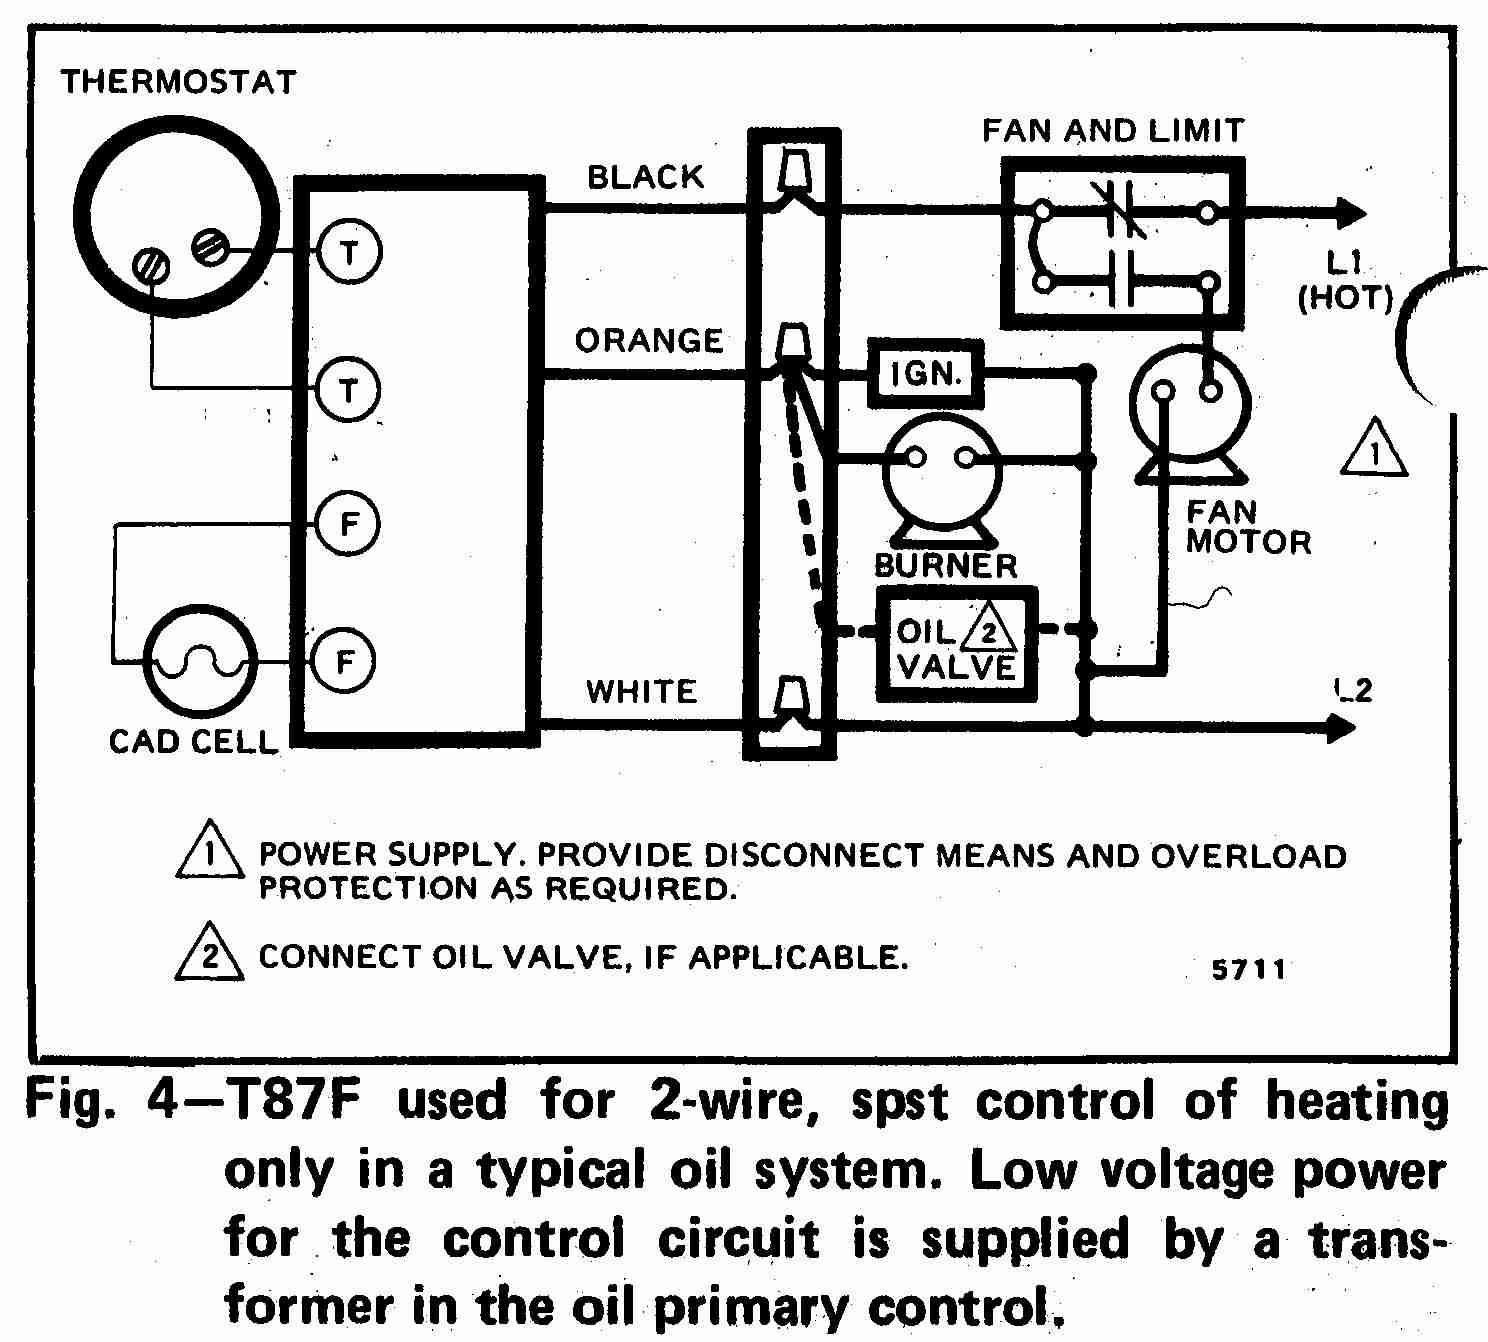 Taco Sr504 4 Wiring Diagram 27 Images Zvc404 100 Relay Zone Valve Repairs Heating Tt T87f 0002 2w Djfresize6652c600ssl1